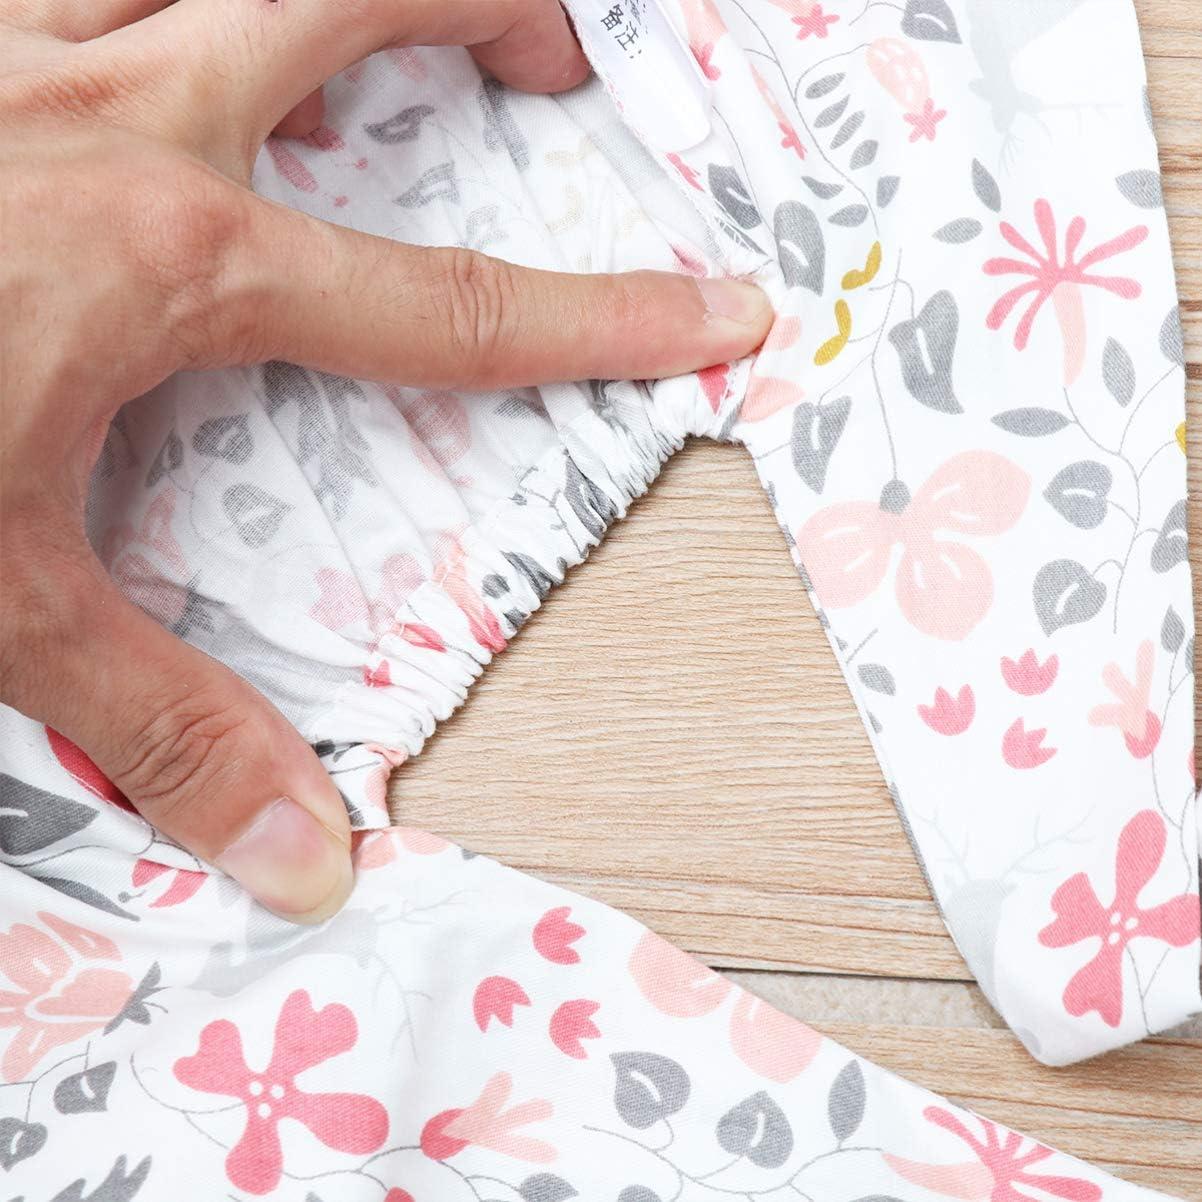 KESYOO Surgical Scrub Cap Flower Pattern Cotton Adjustable Scrub Hat Medical Doctor Nurse Cap Bouffant for Women Men